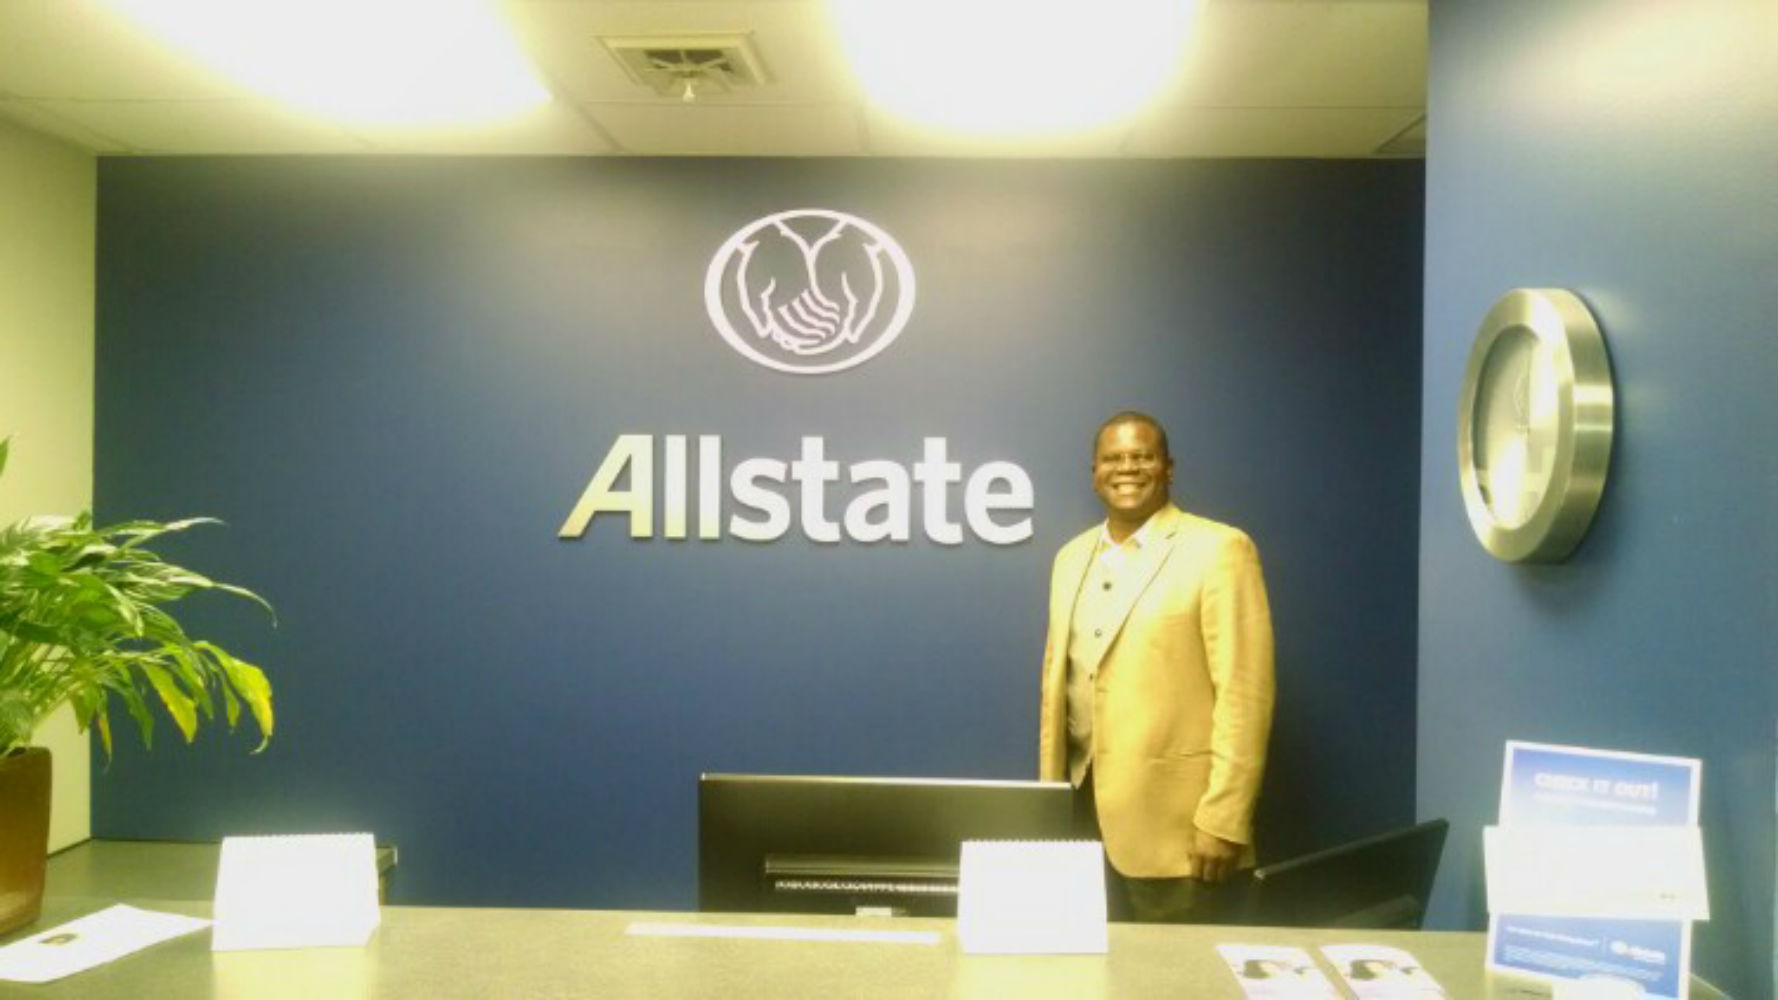 Darryl Moore: Allstate Insurance image 2